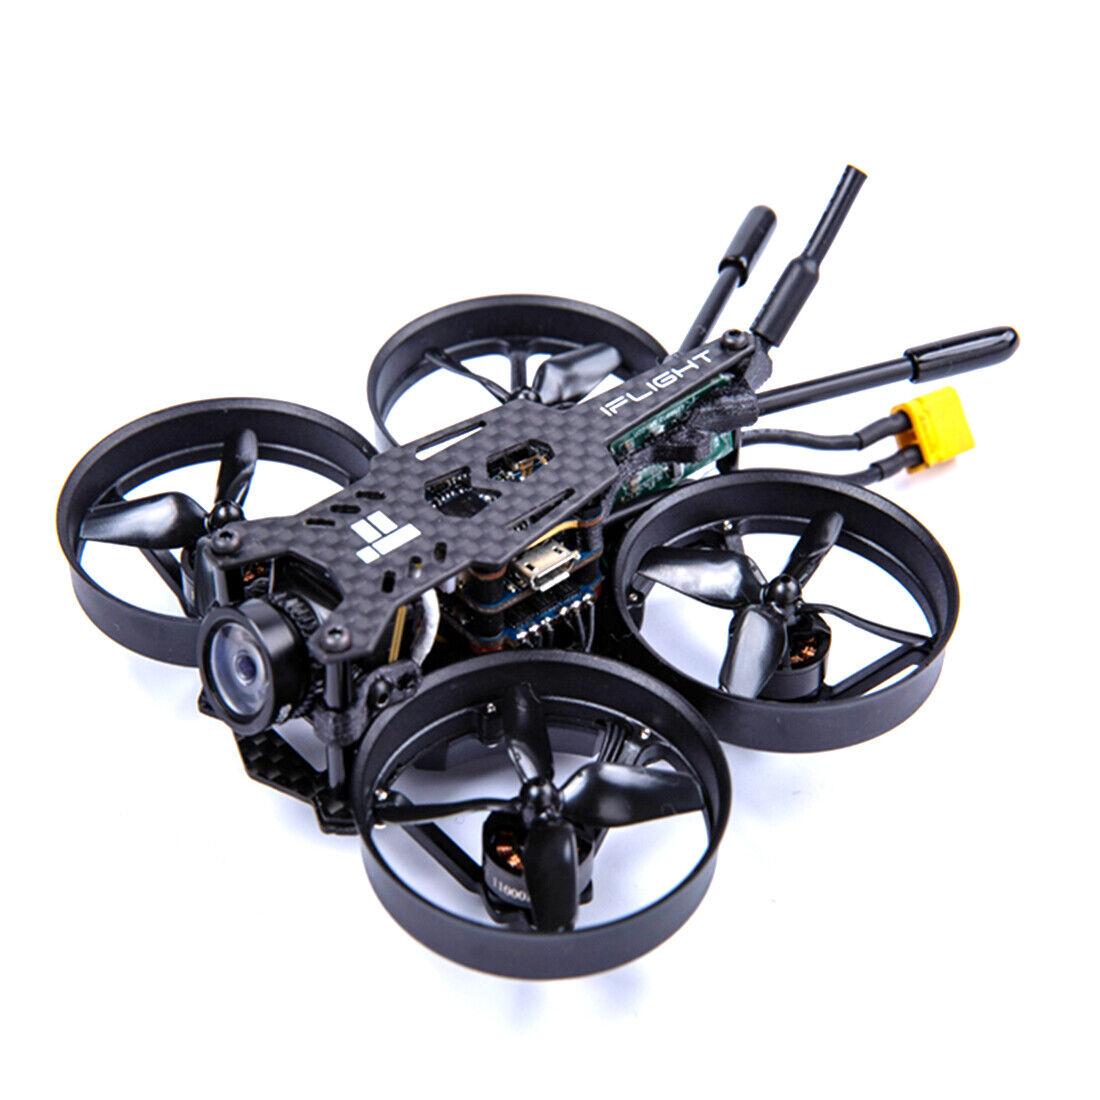 IFlight CineBee 75HD 2-4S Race Drone SucceX F4 Torre 12A 4in1 Esc VTX FPV